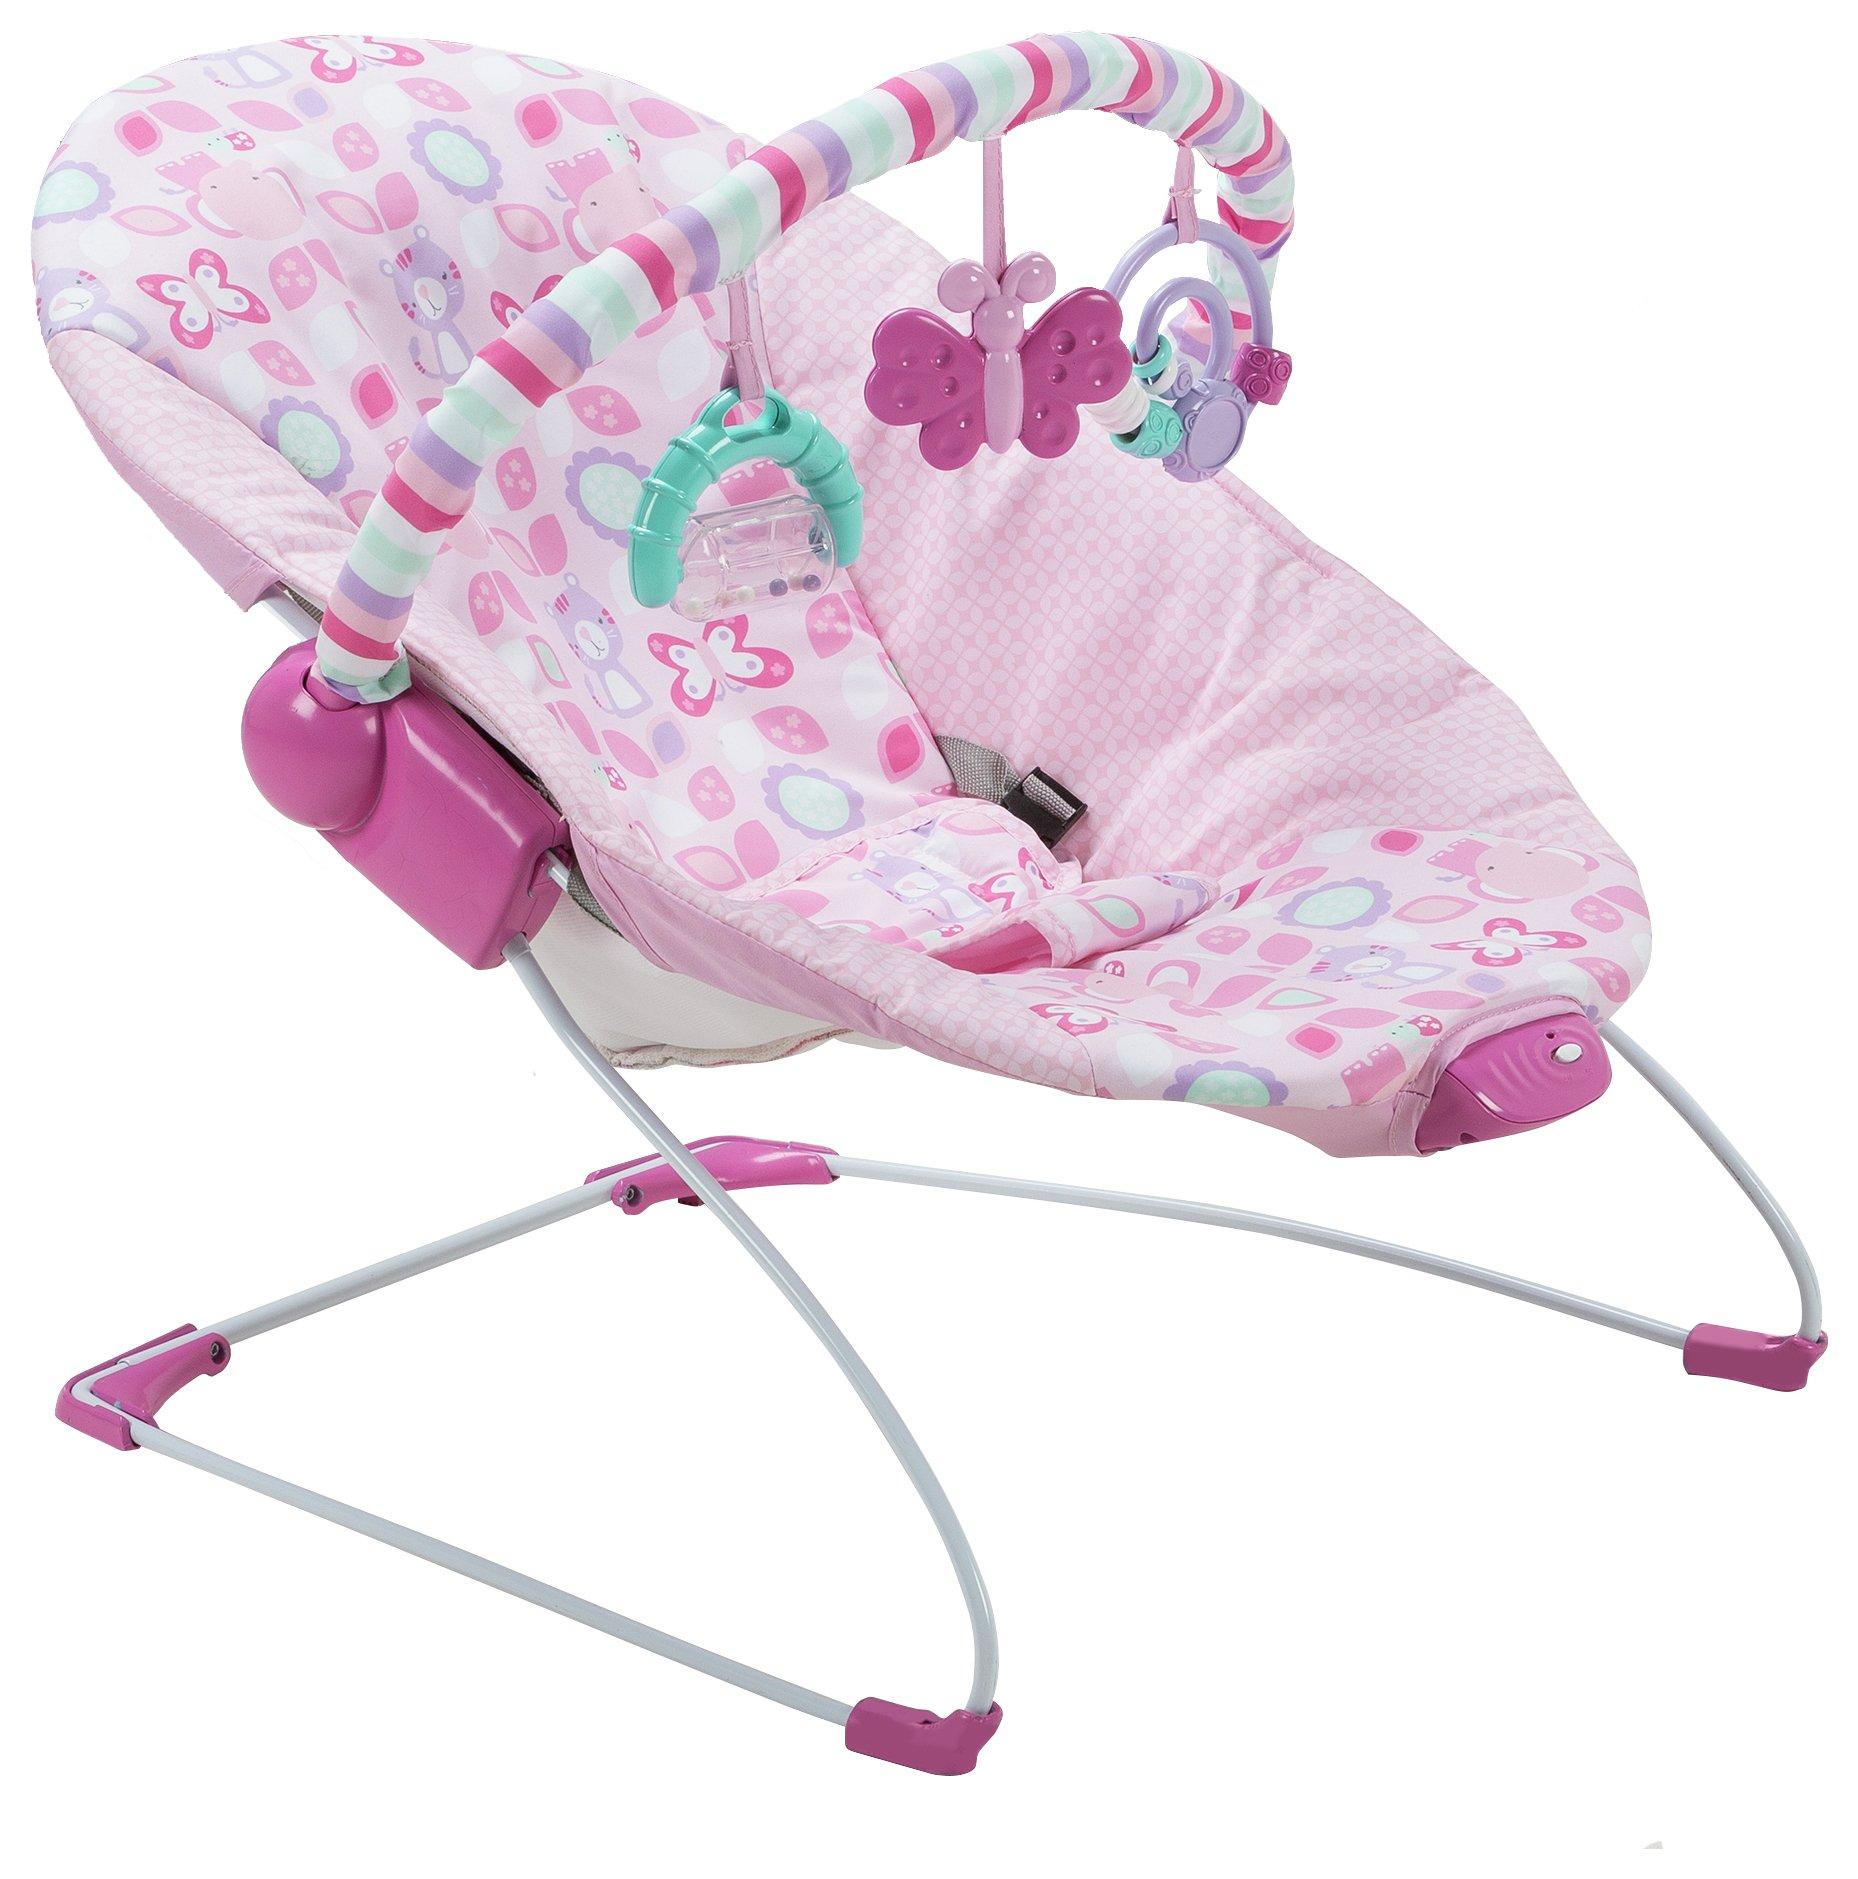 argos baby bouncer chair louis xvi chad valley circus friends